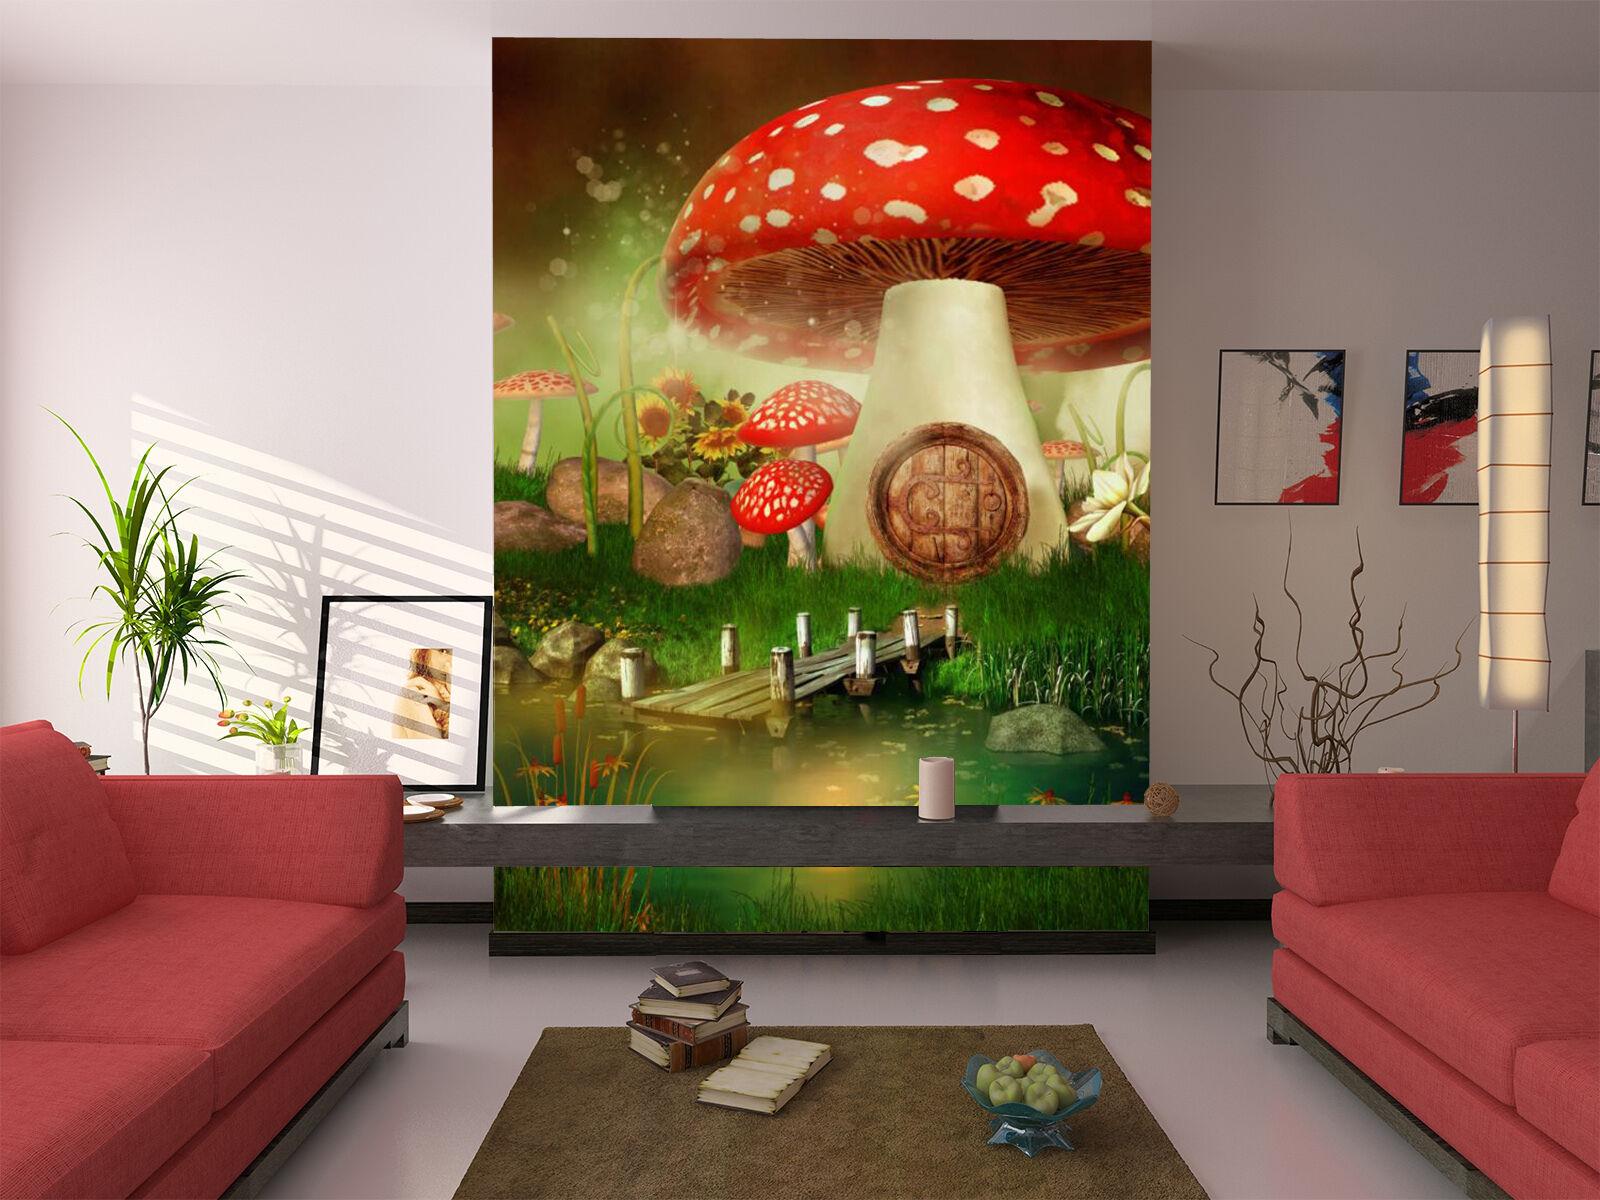 3D Mushroom house Grassland Wall Paper Print Decal Wall Deco Indoor wall Mural